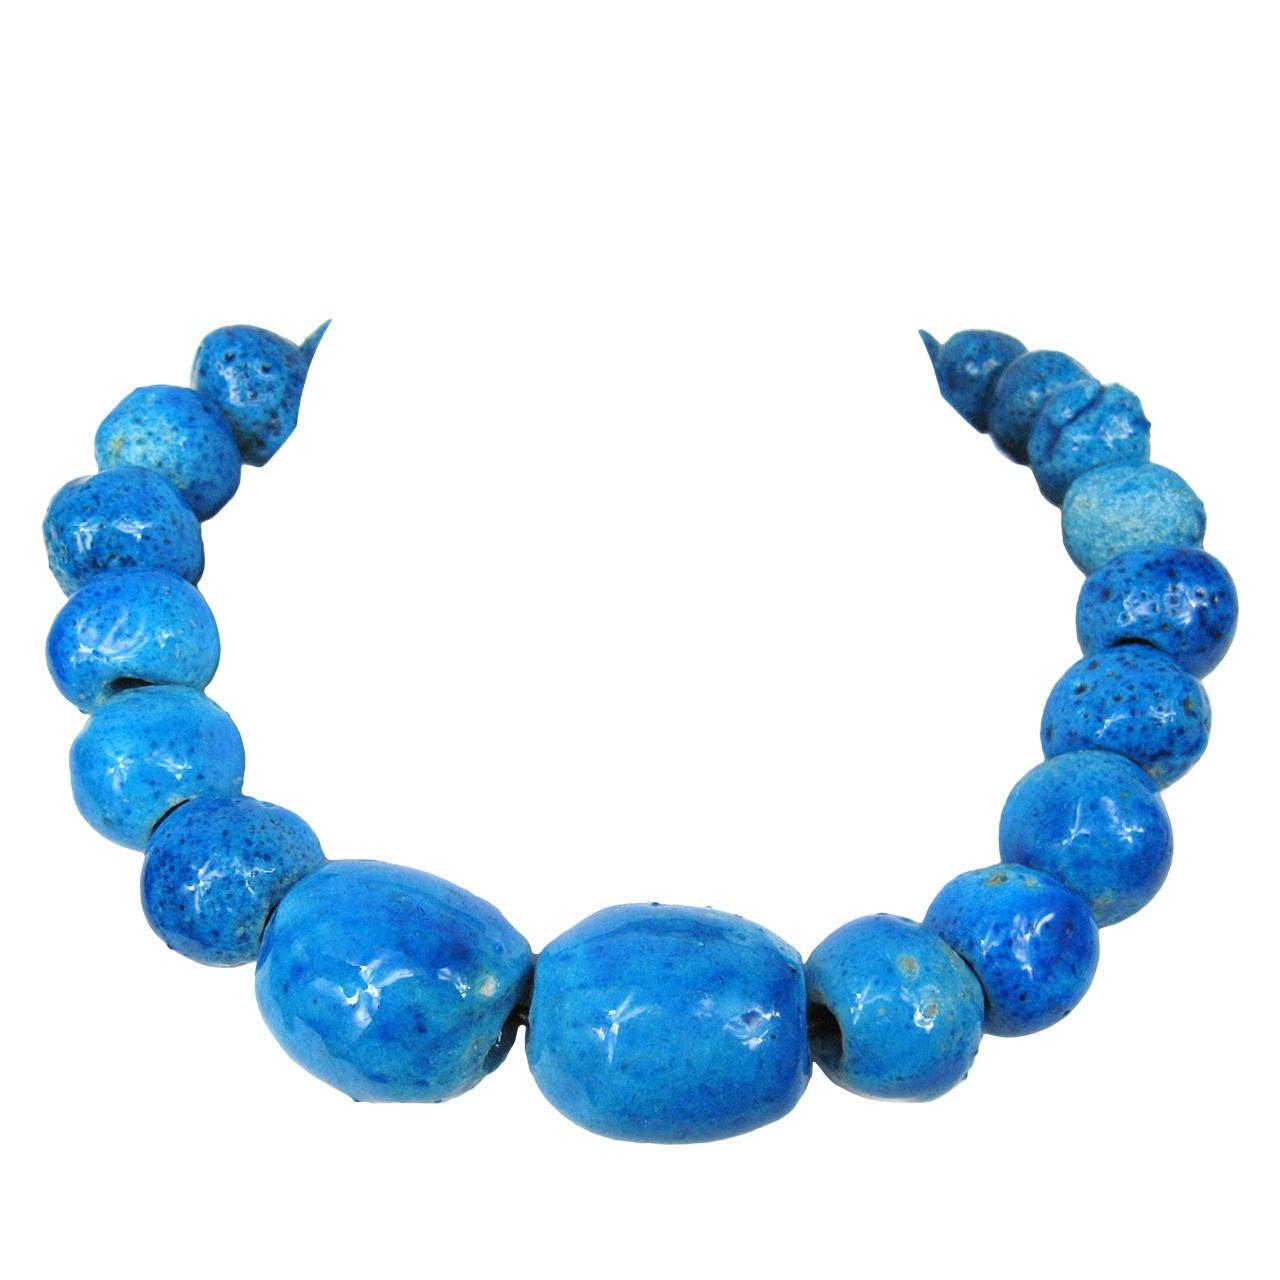 Oversized Ceramic Porcelain Blue Bead Necklace 1